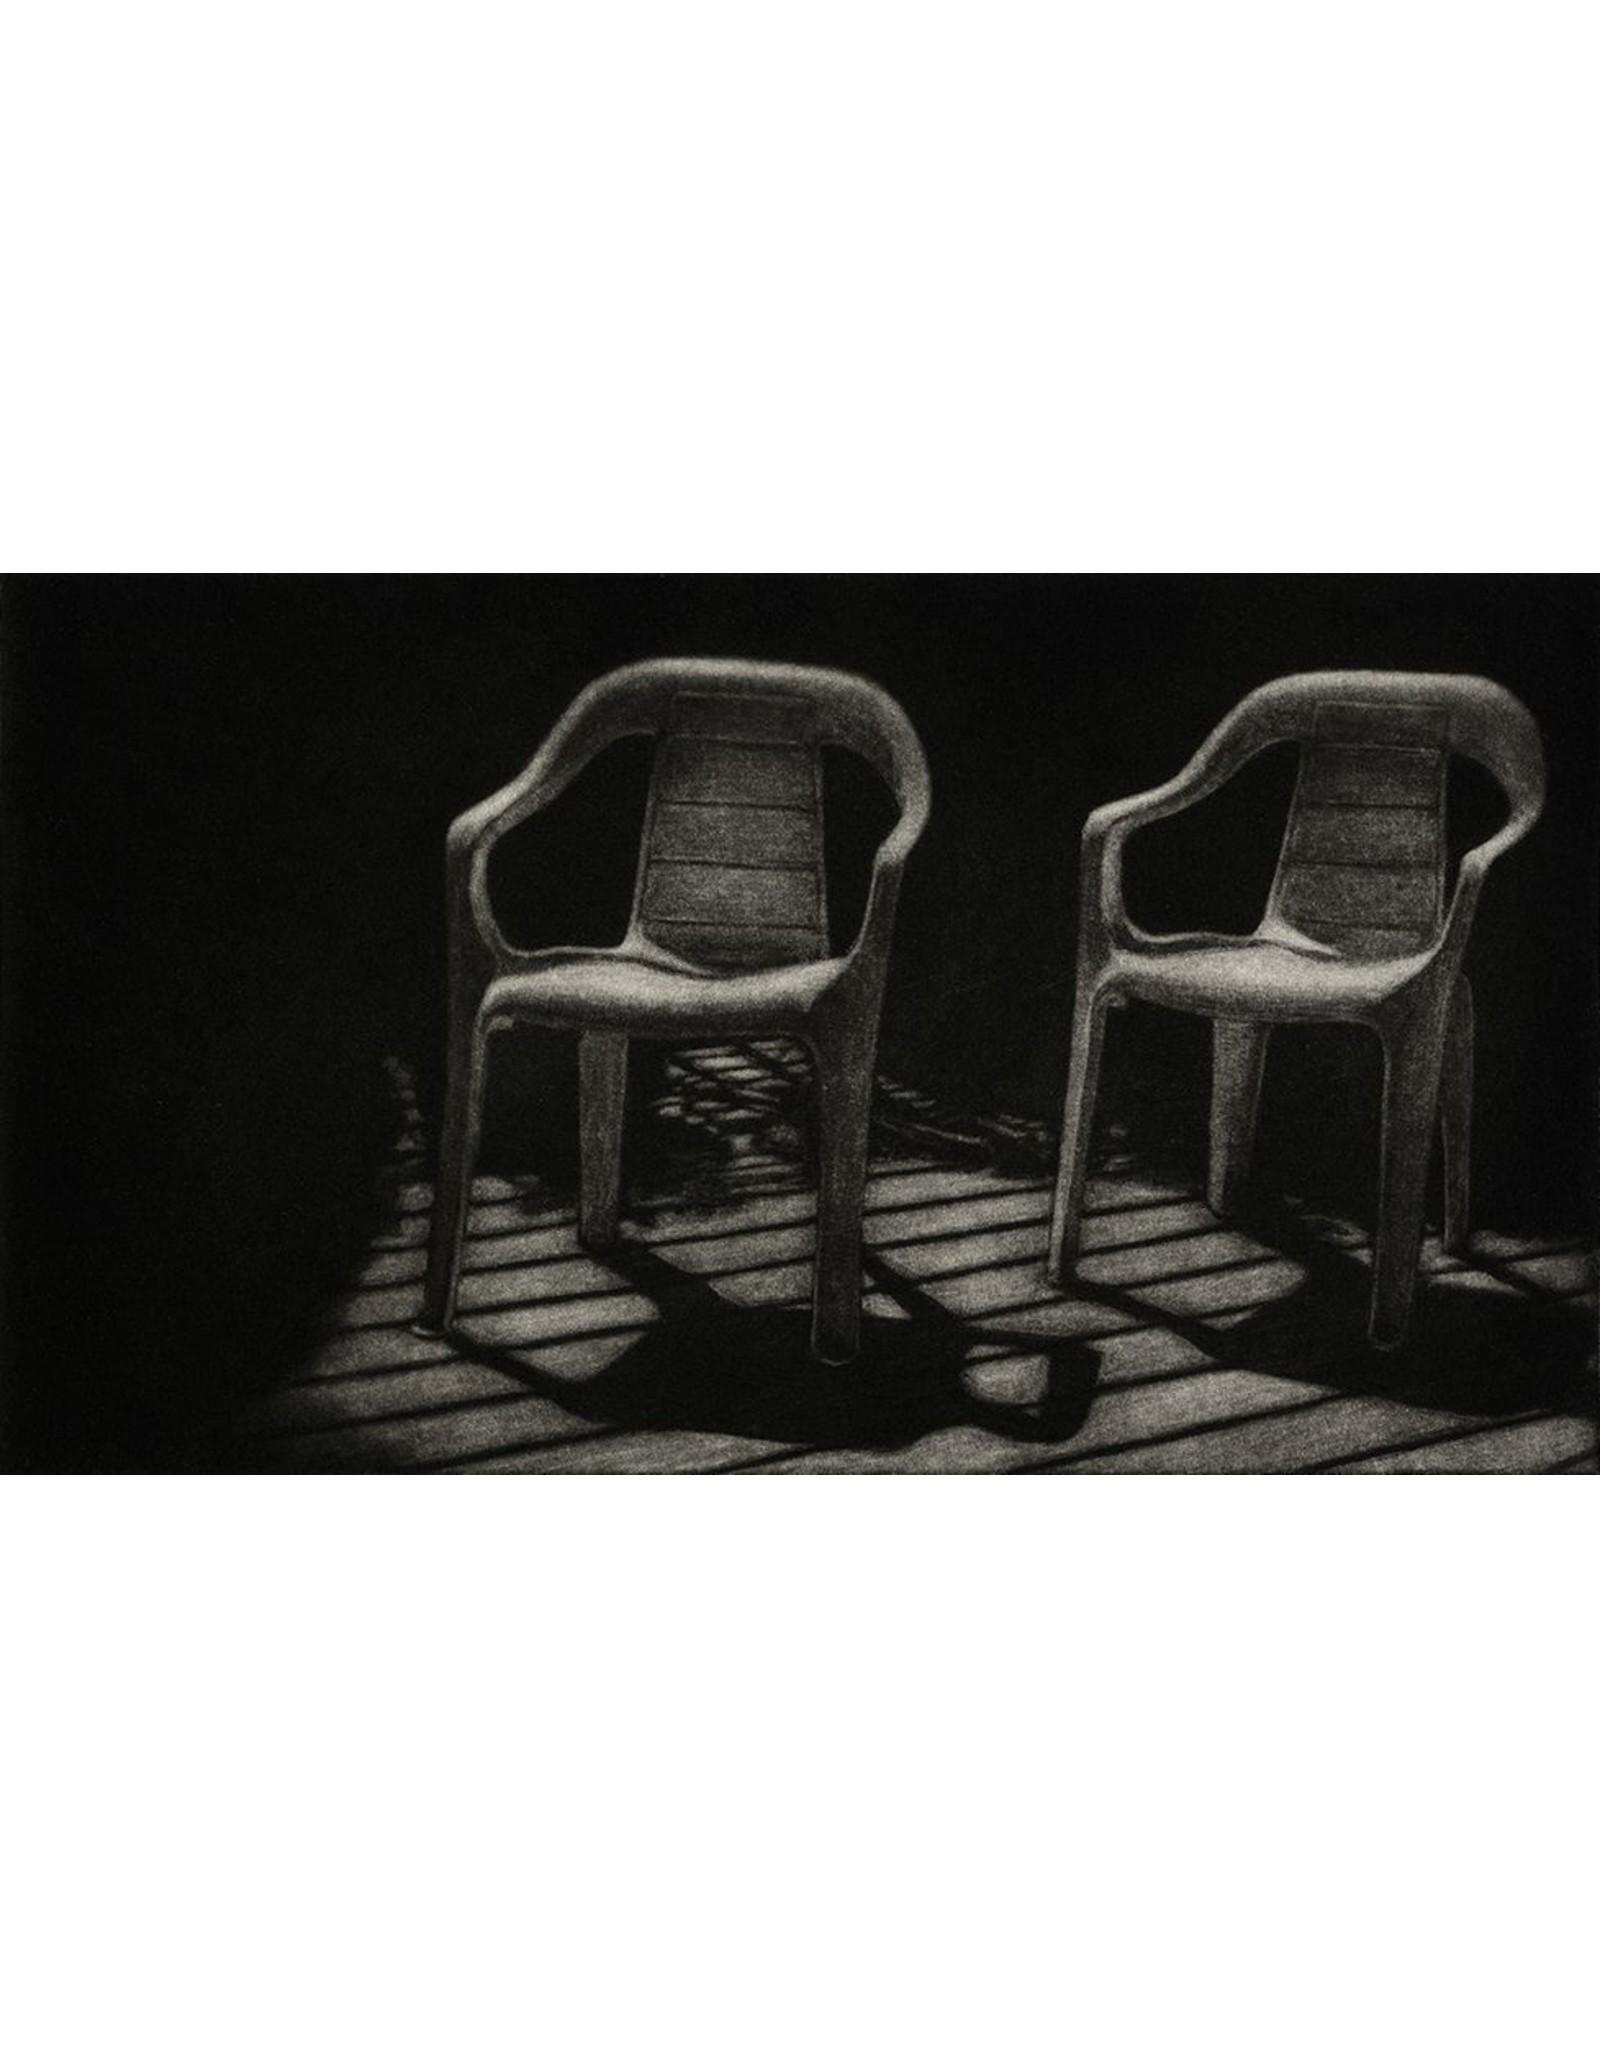 Howorth, E.J. 2 Lawn Chairs, E.J. Howorth